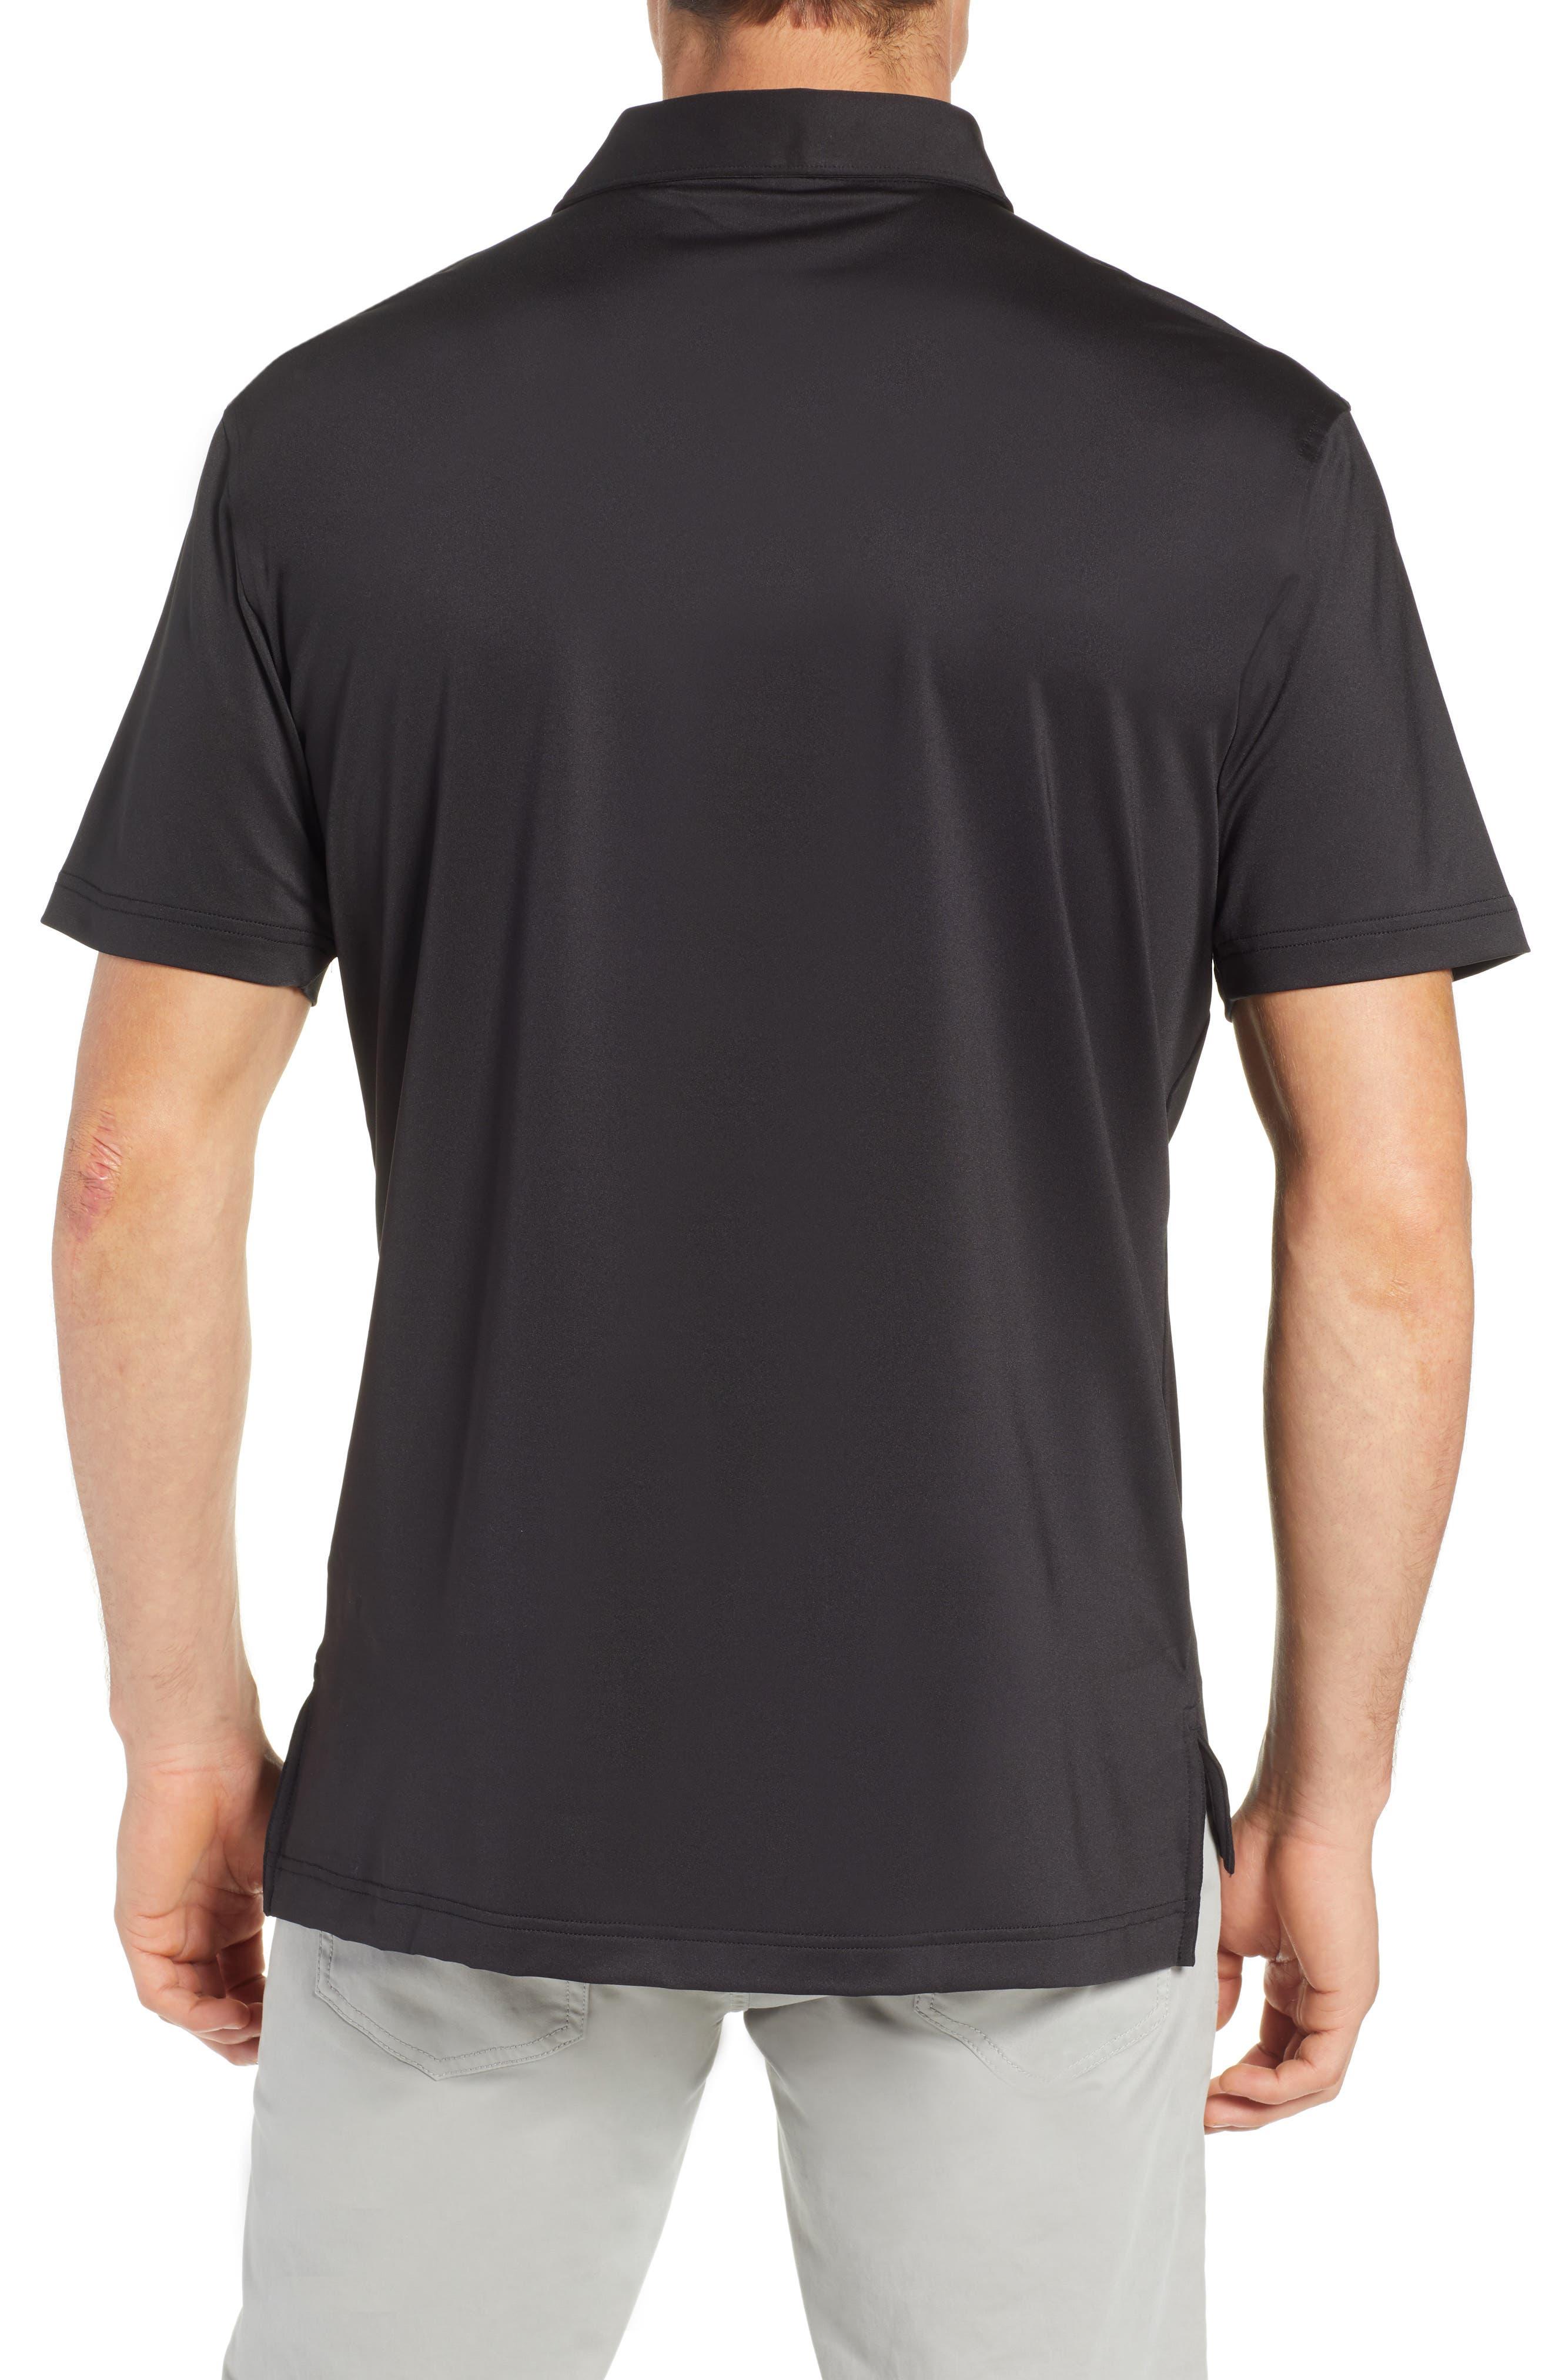 PETER MILLAR, Sean Regular Fit Stretch Jersey Polo, Alternate thumbnail 2, color, BLACK